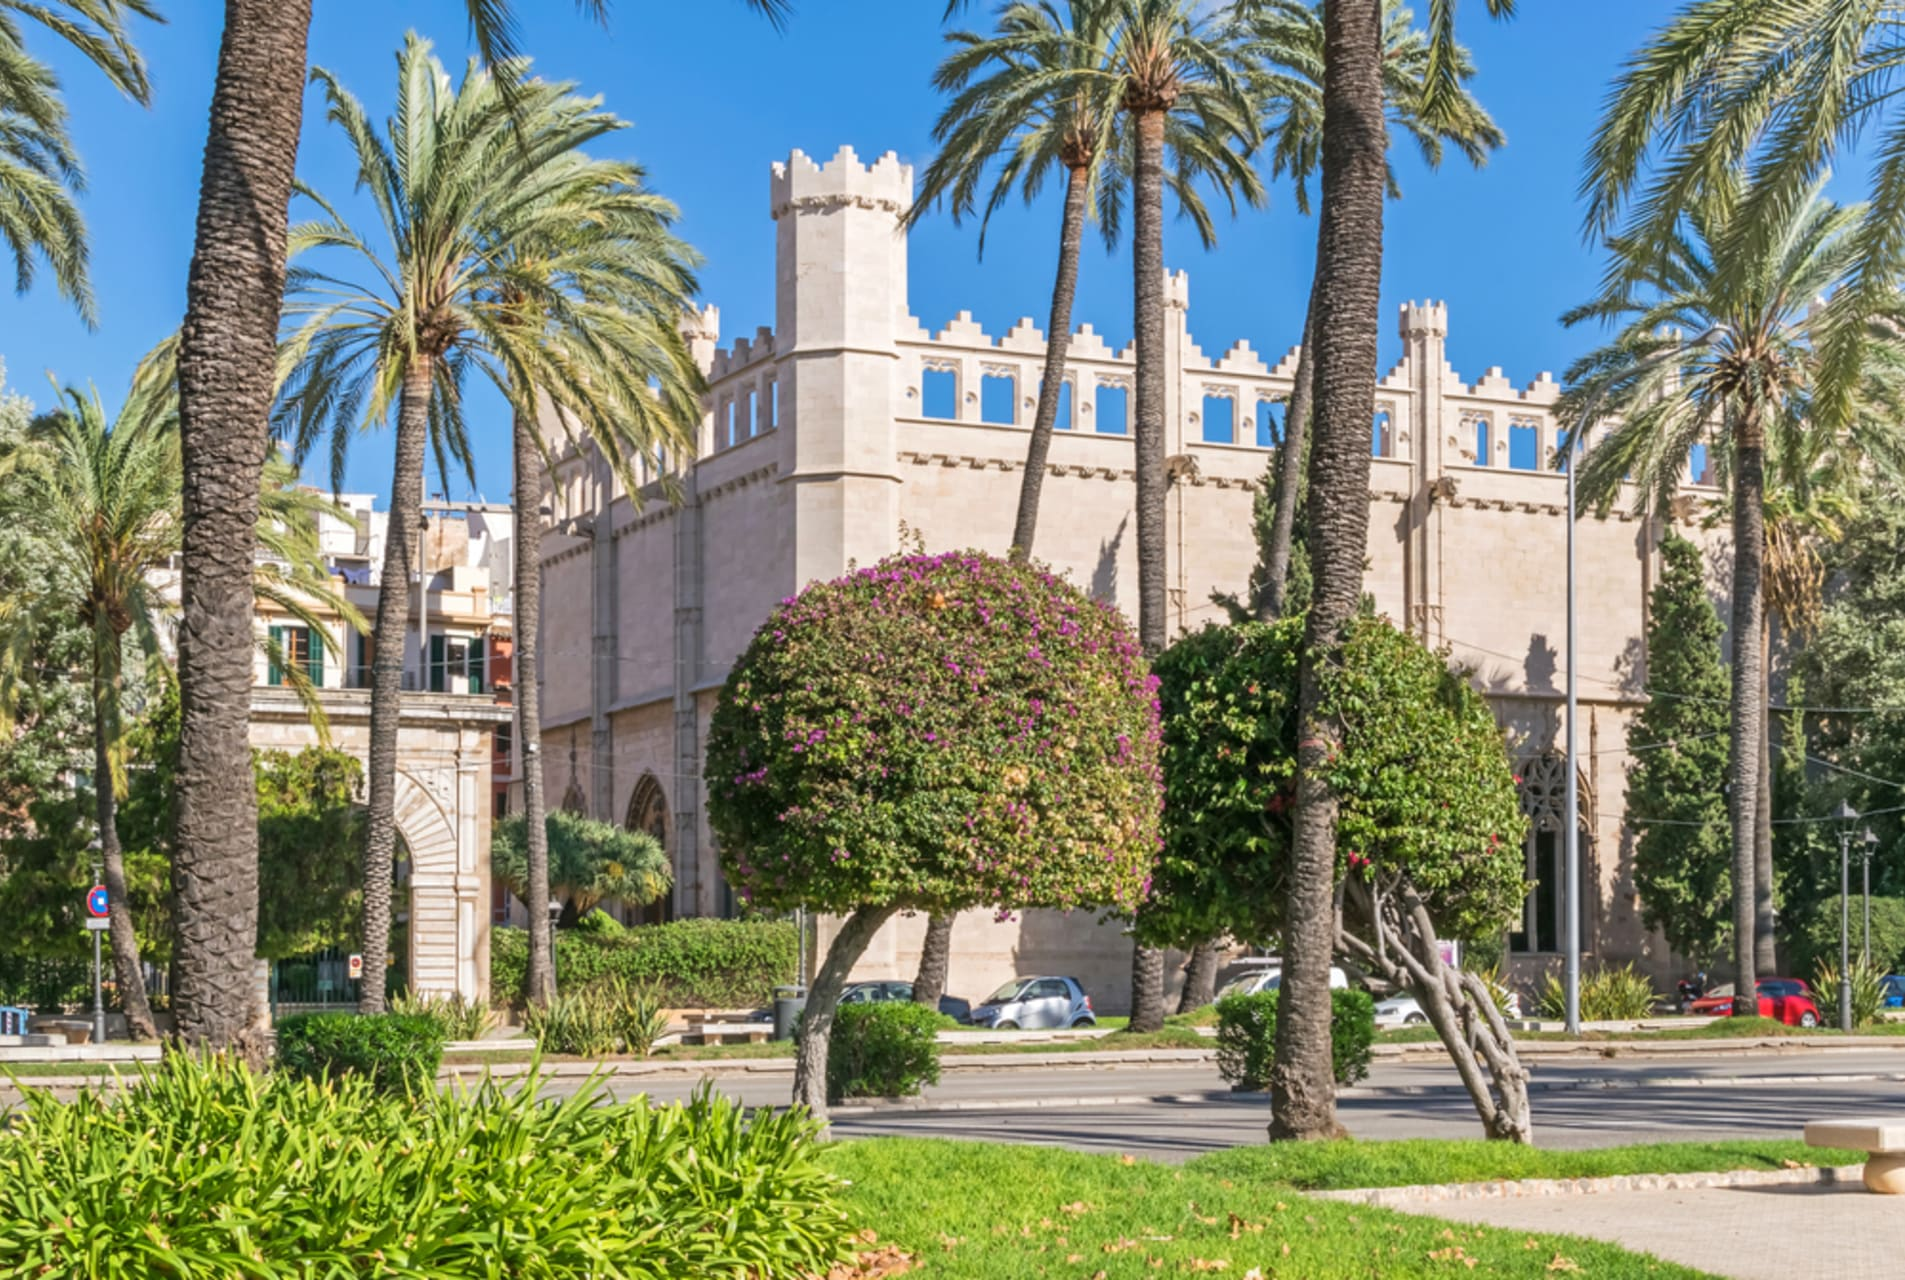 Mallorca - Palma: La LLotja Quarter - The city by the Sea